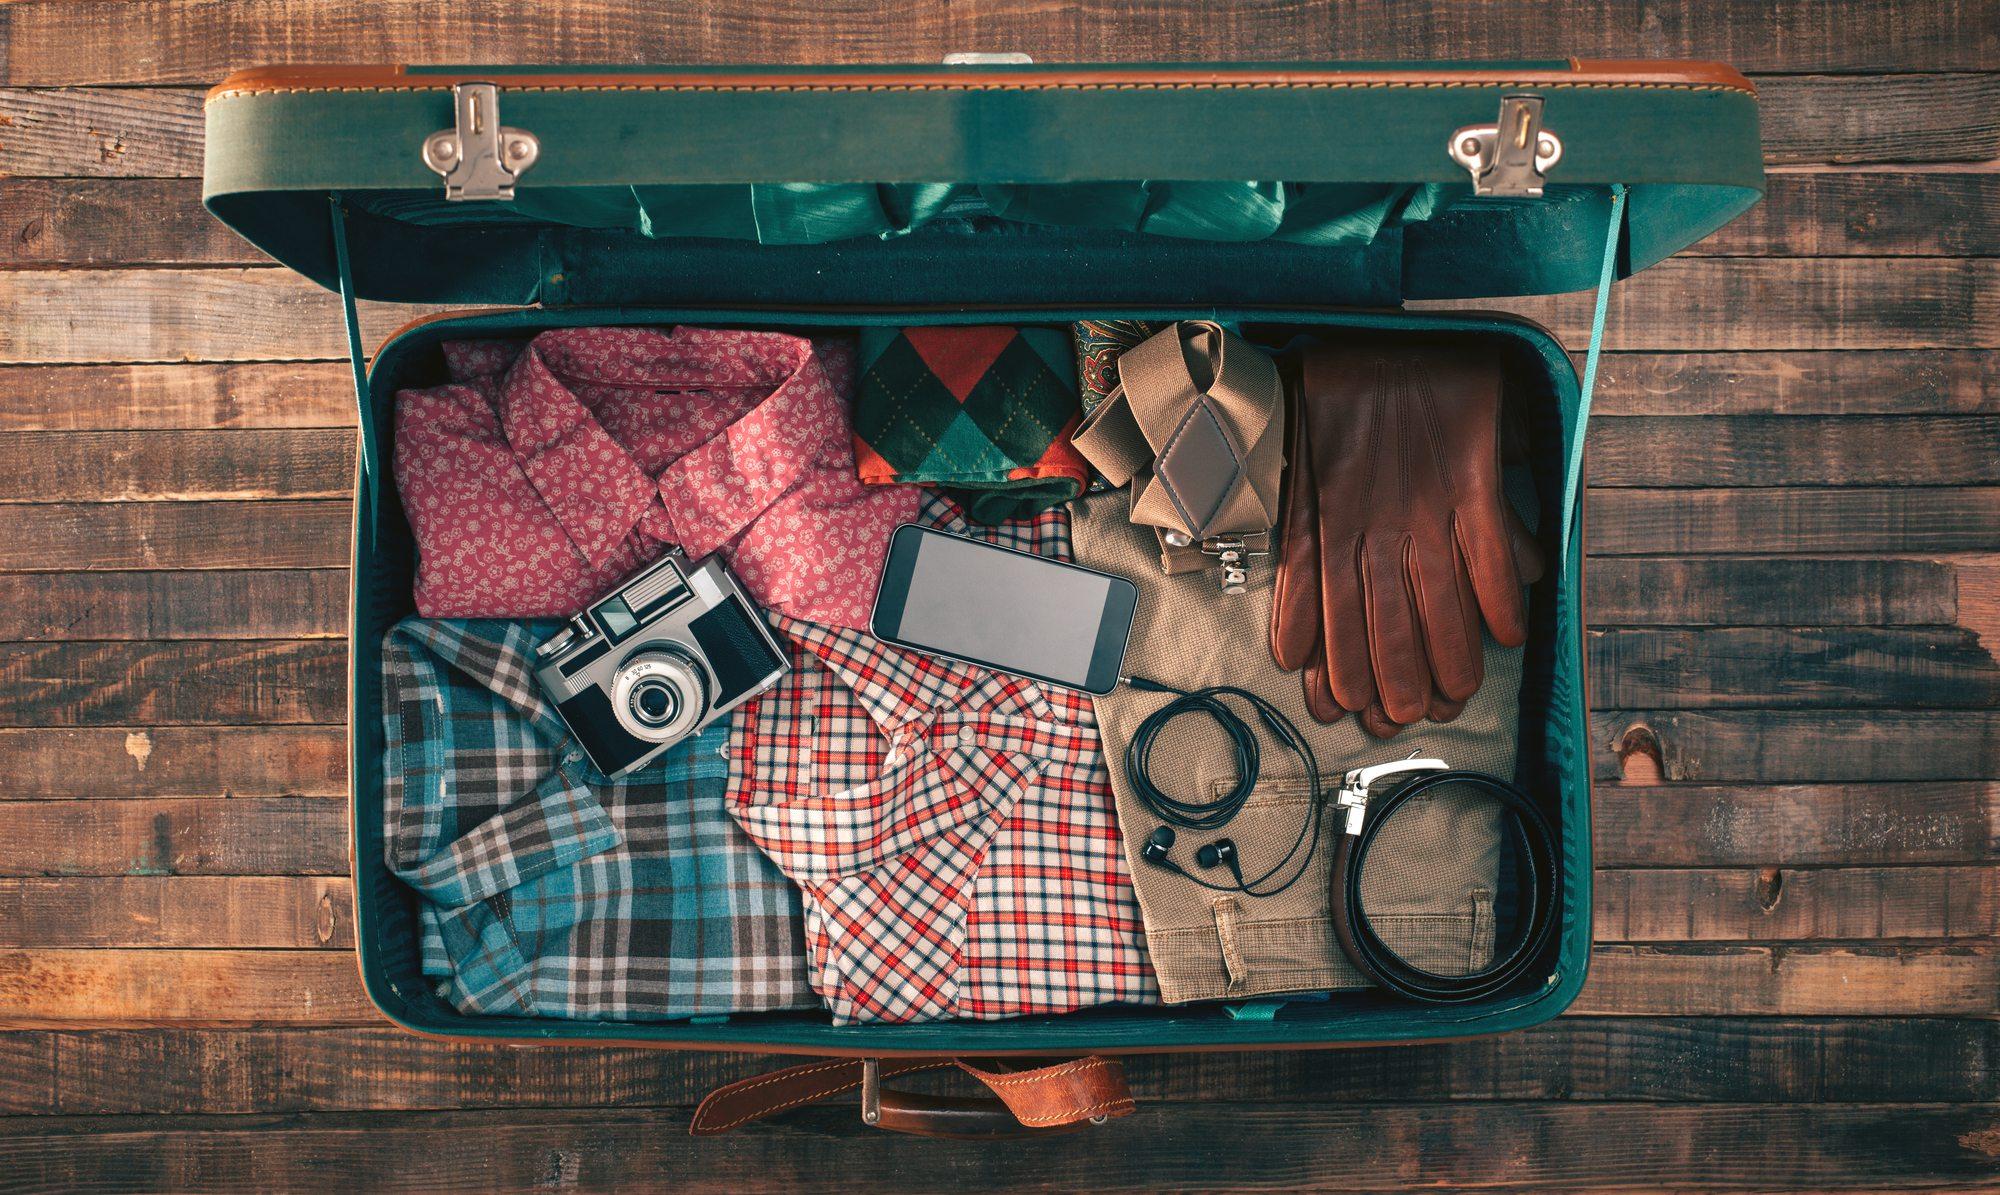 6 Best Weekend Getaways from Chanhassen